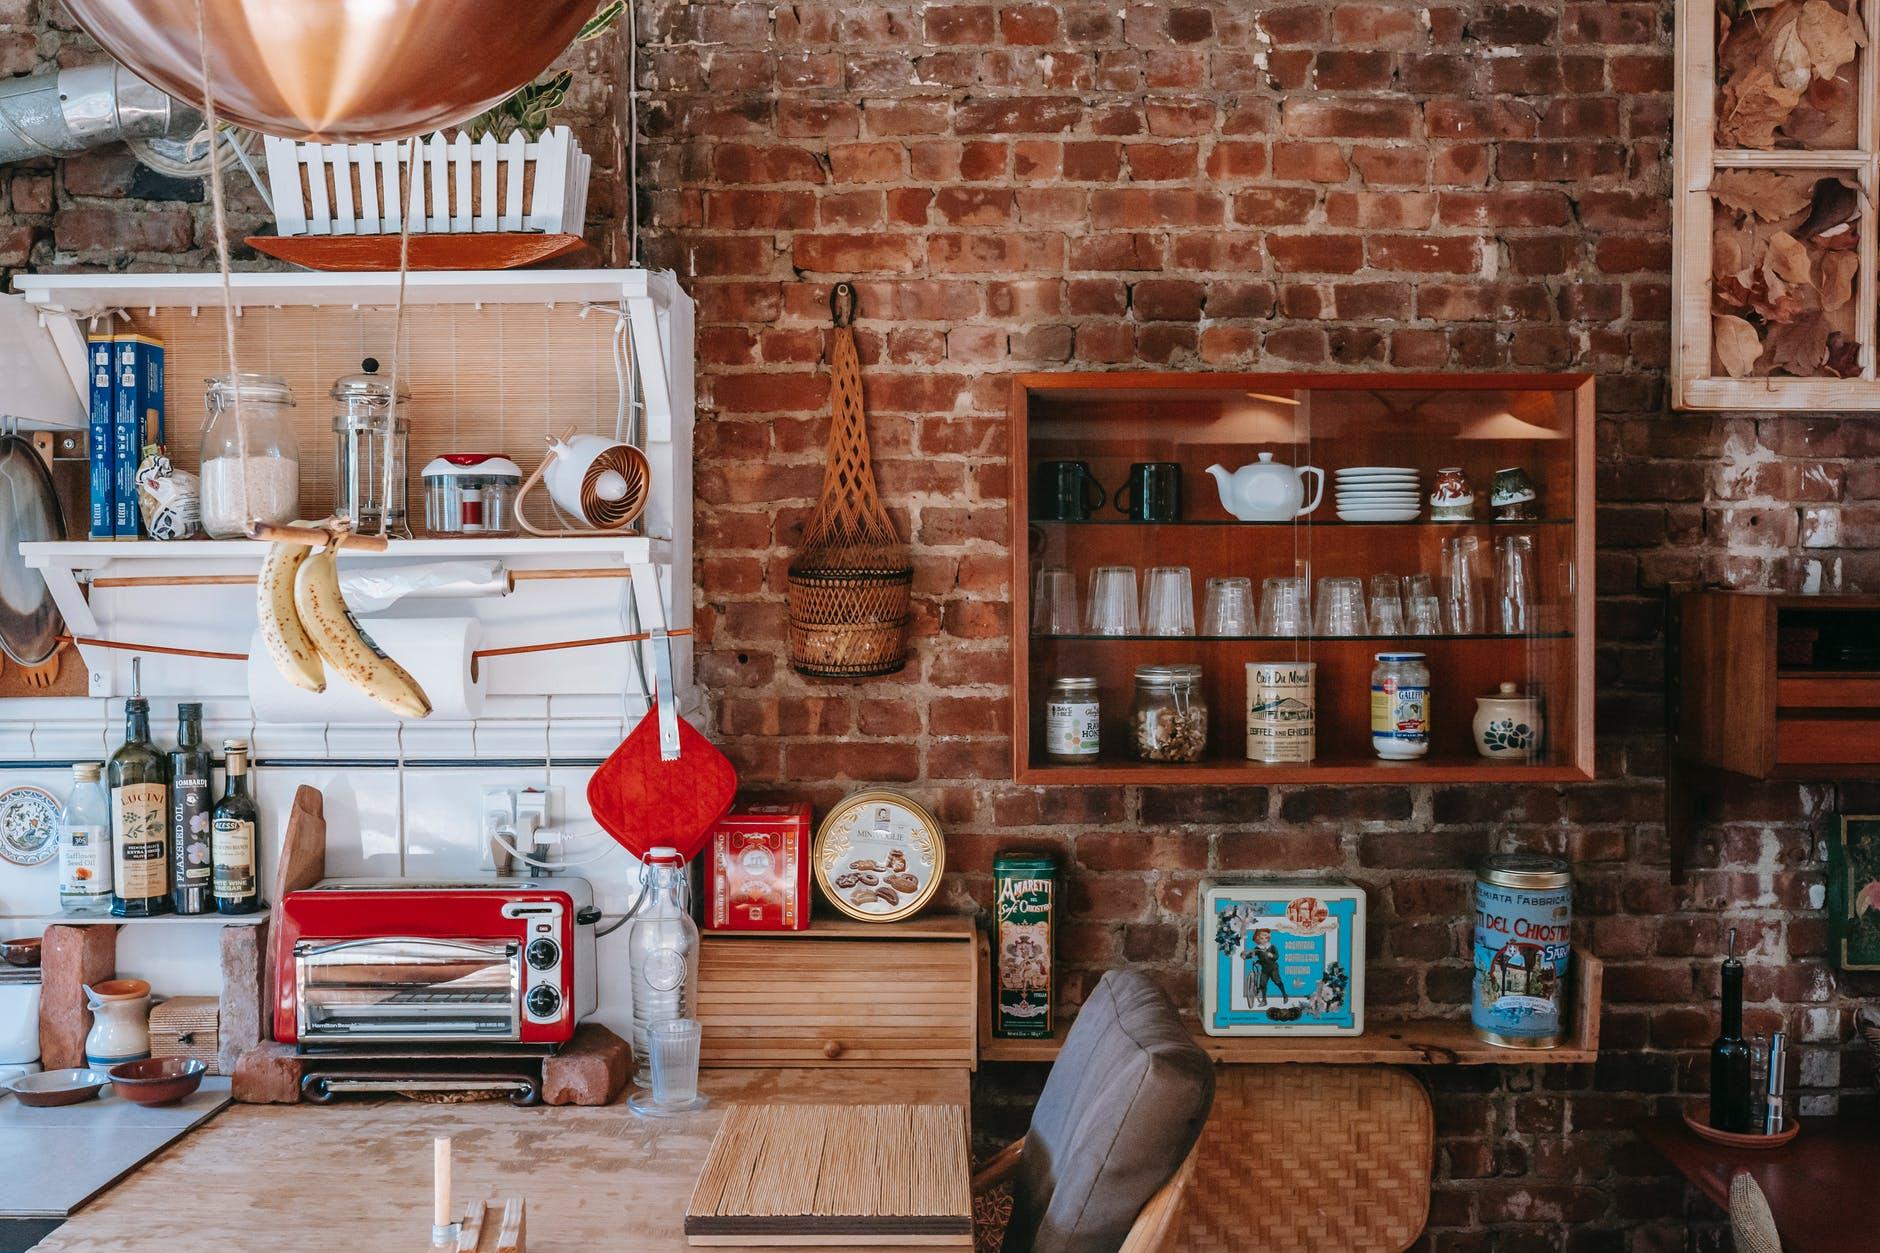 Cosa non deve mancare in una cucina rustica